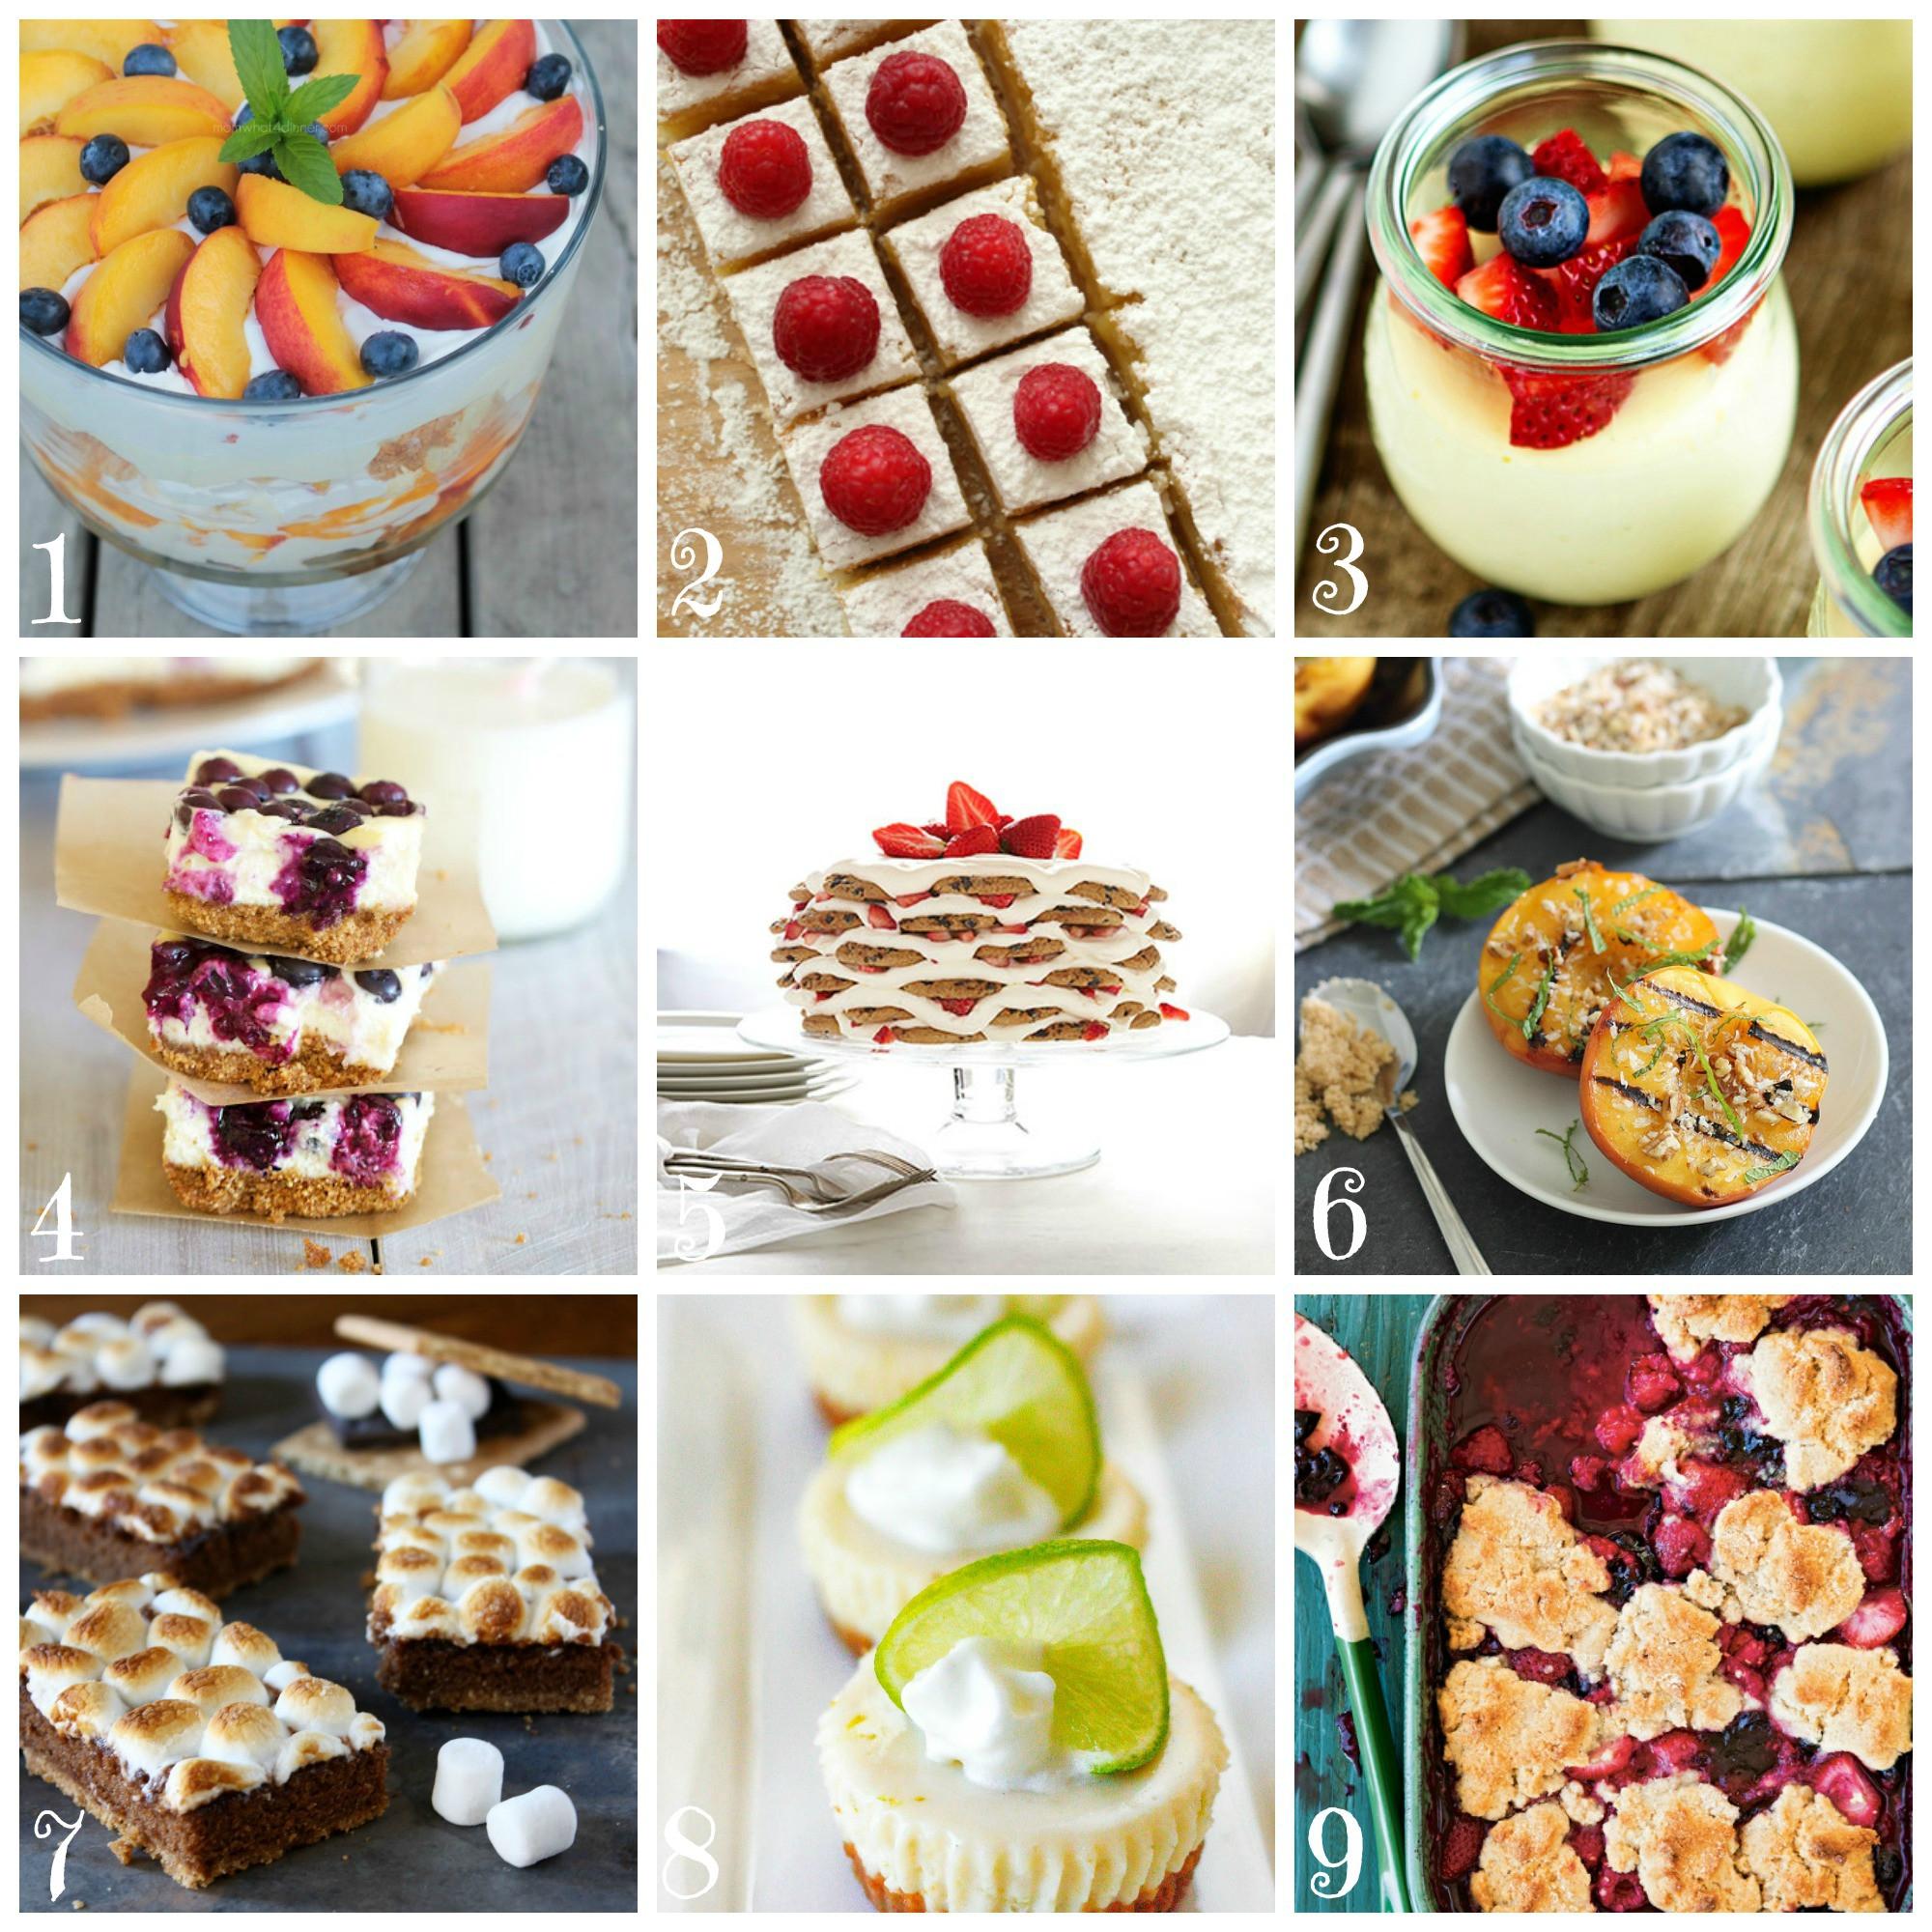 Best Summer Desserts  Best Summer Dessert Recipes • CakeJournal